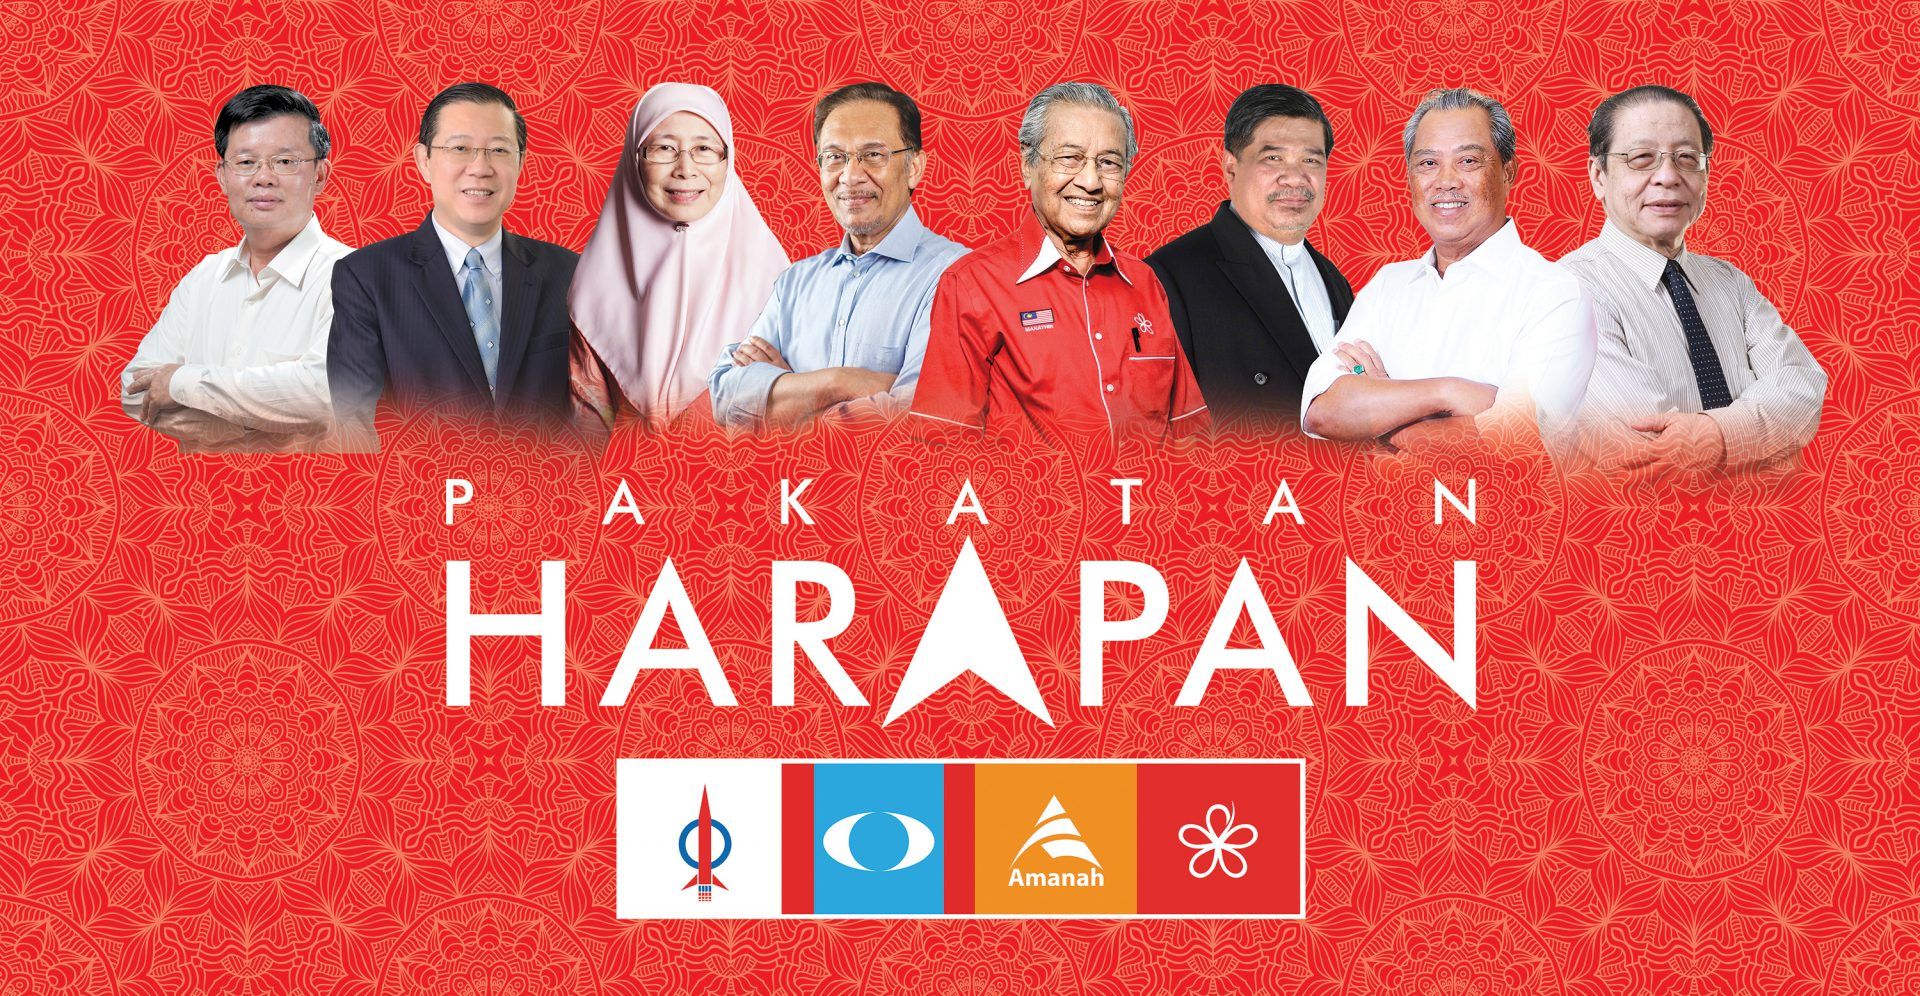 DAP 4 Change Logo